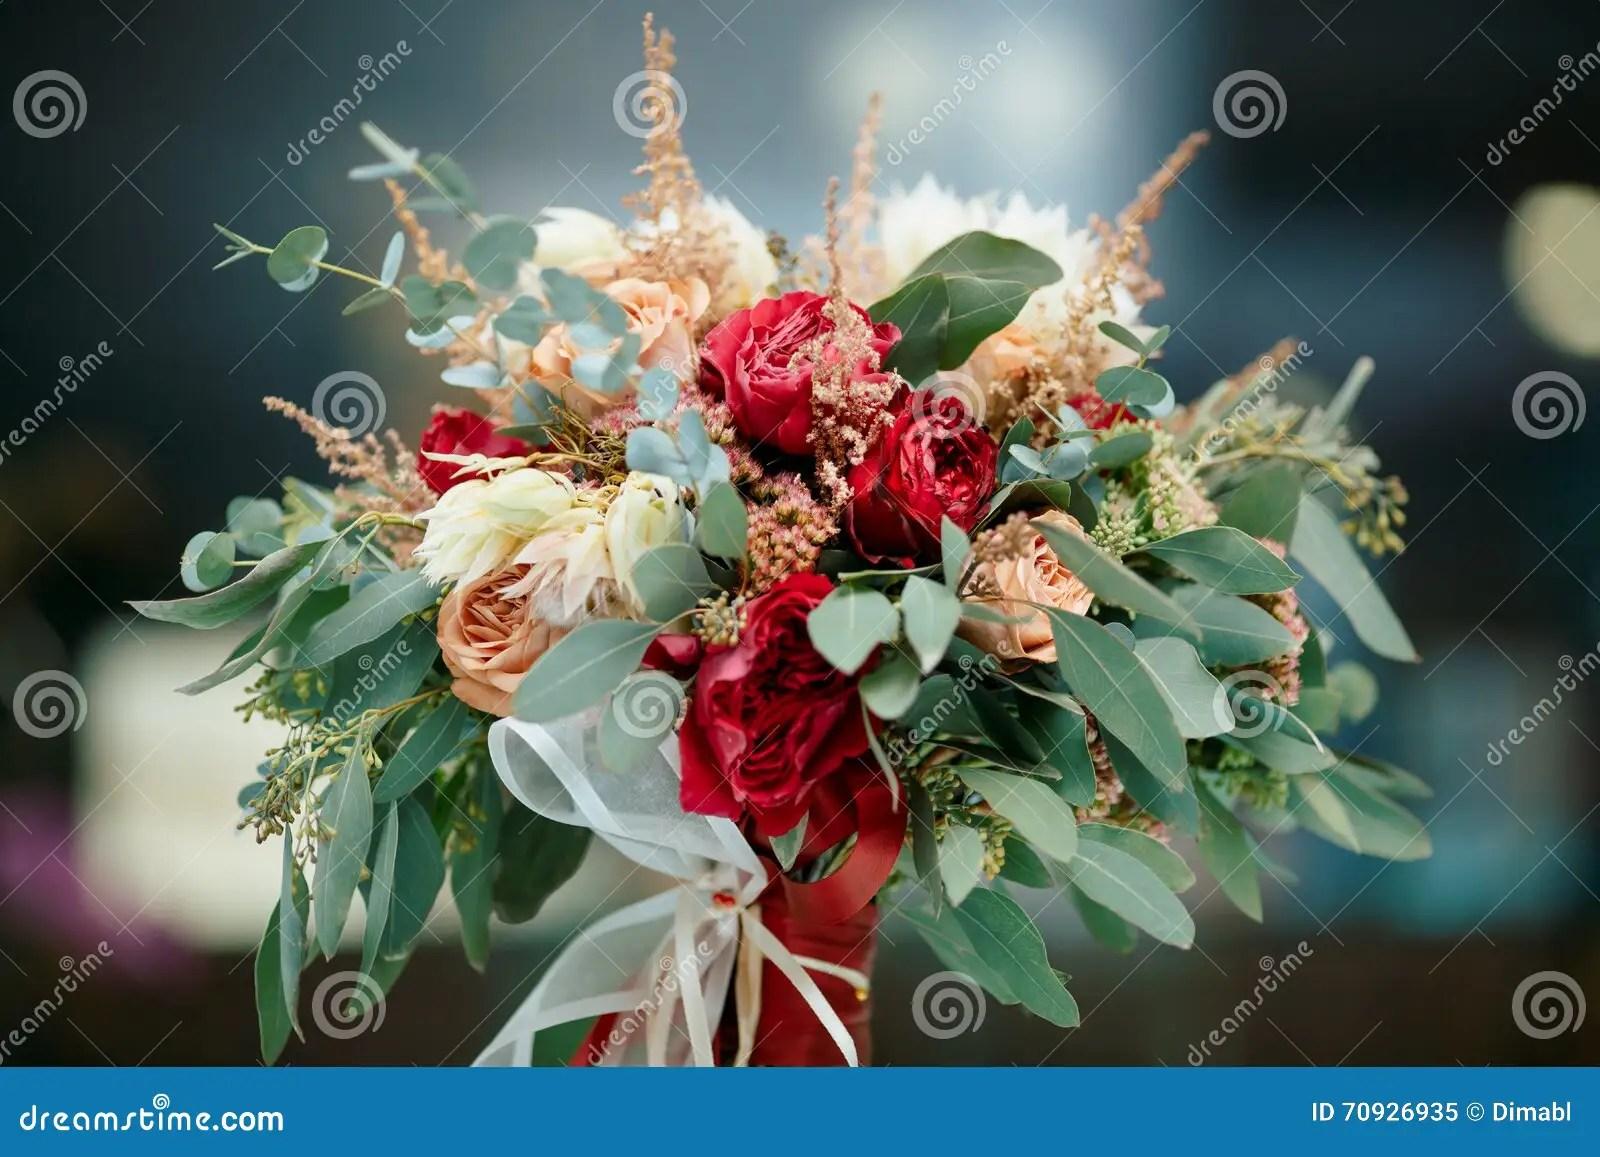 Beautiful Bridal Bouquet Of Fresh Flowers Stock Image